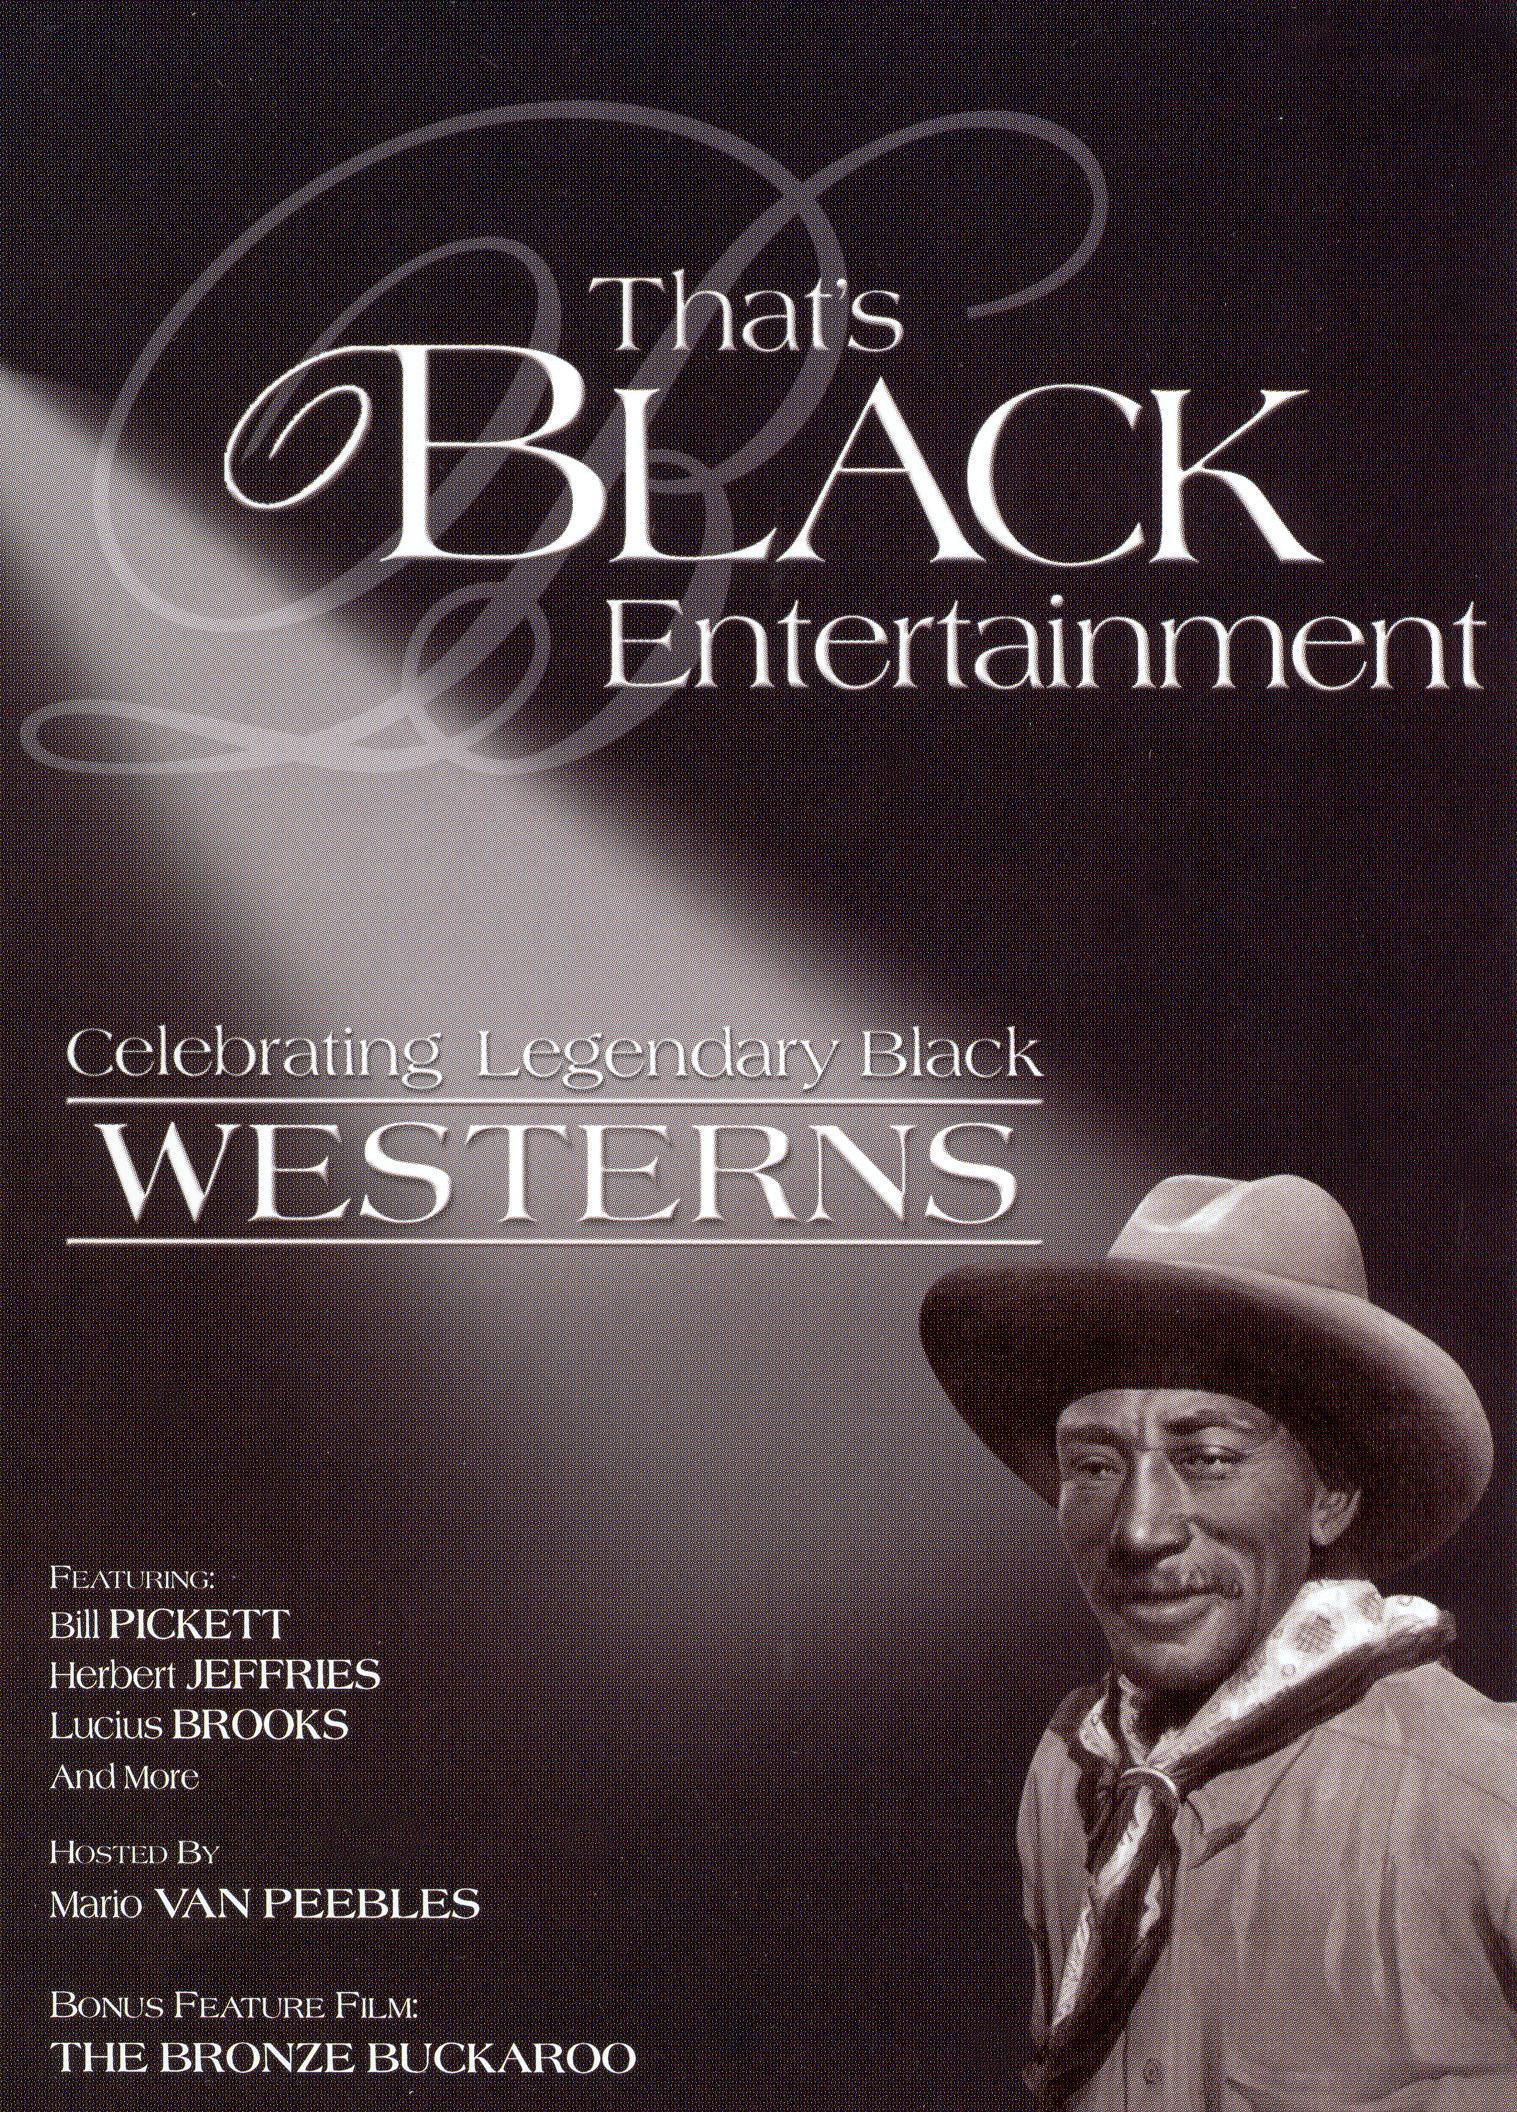 That's Black Entertainment: Celebrating Legendary Black Westerns